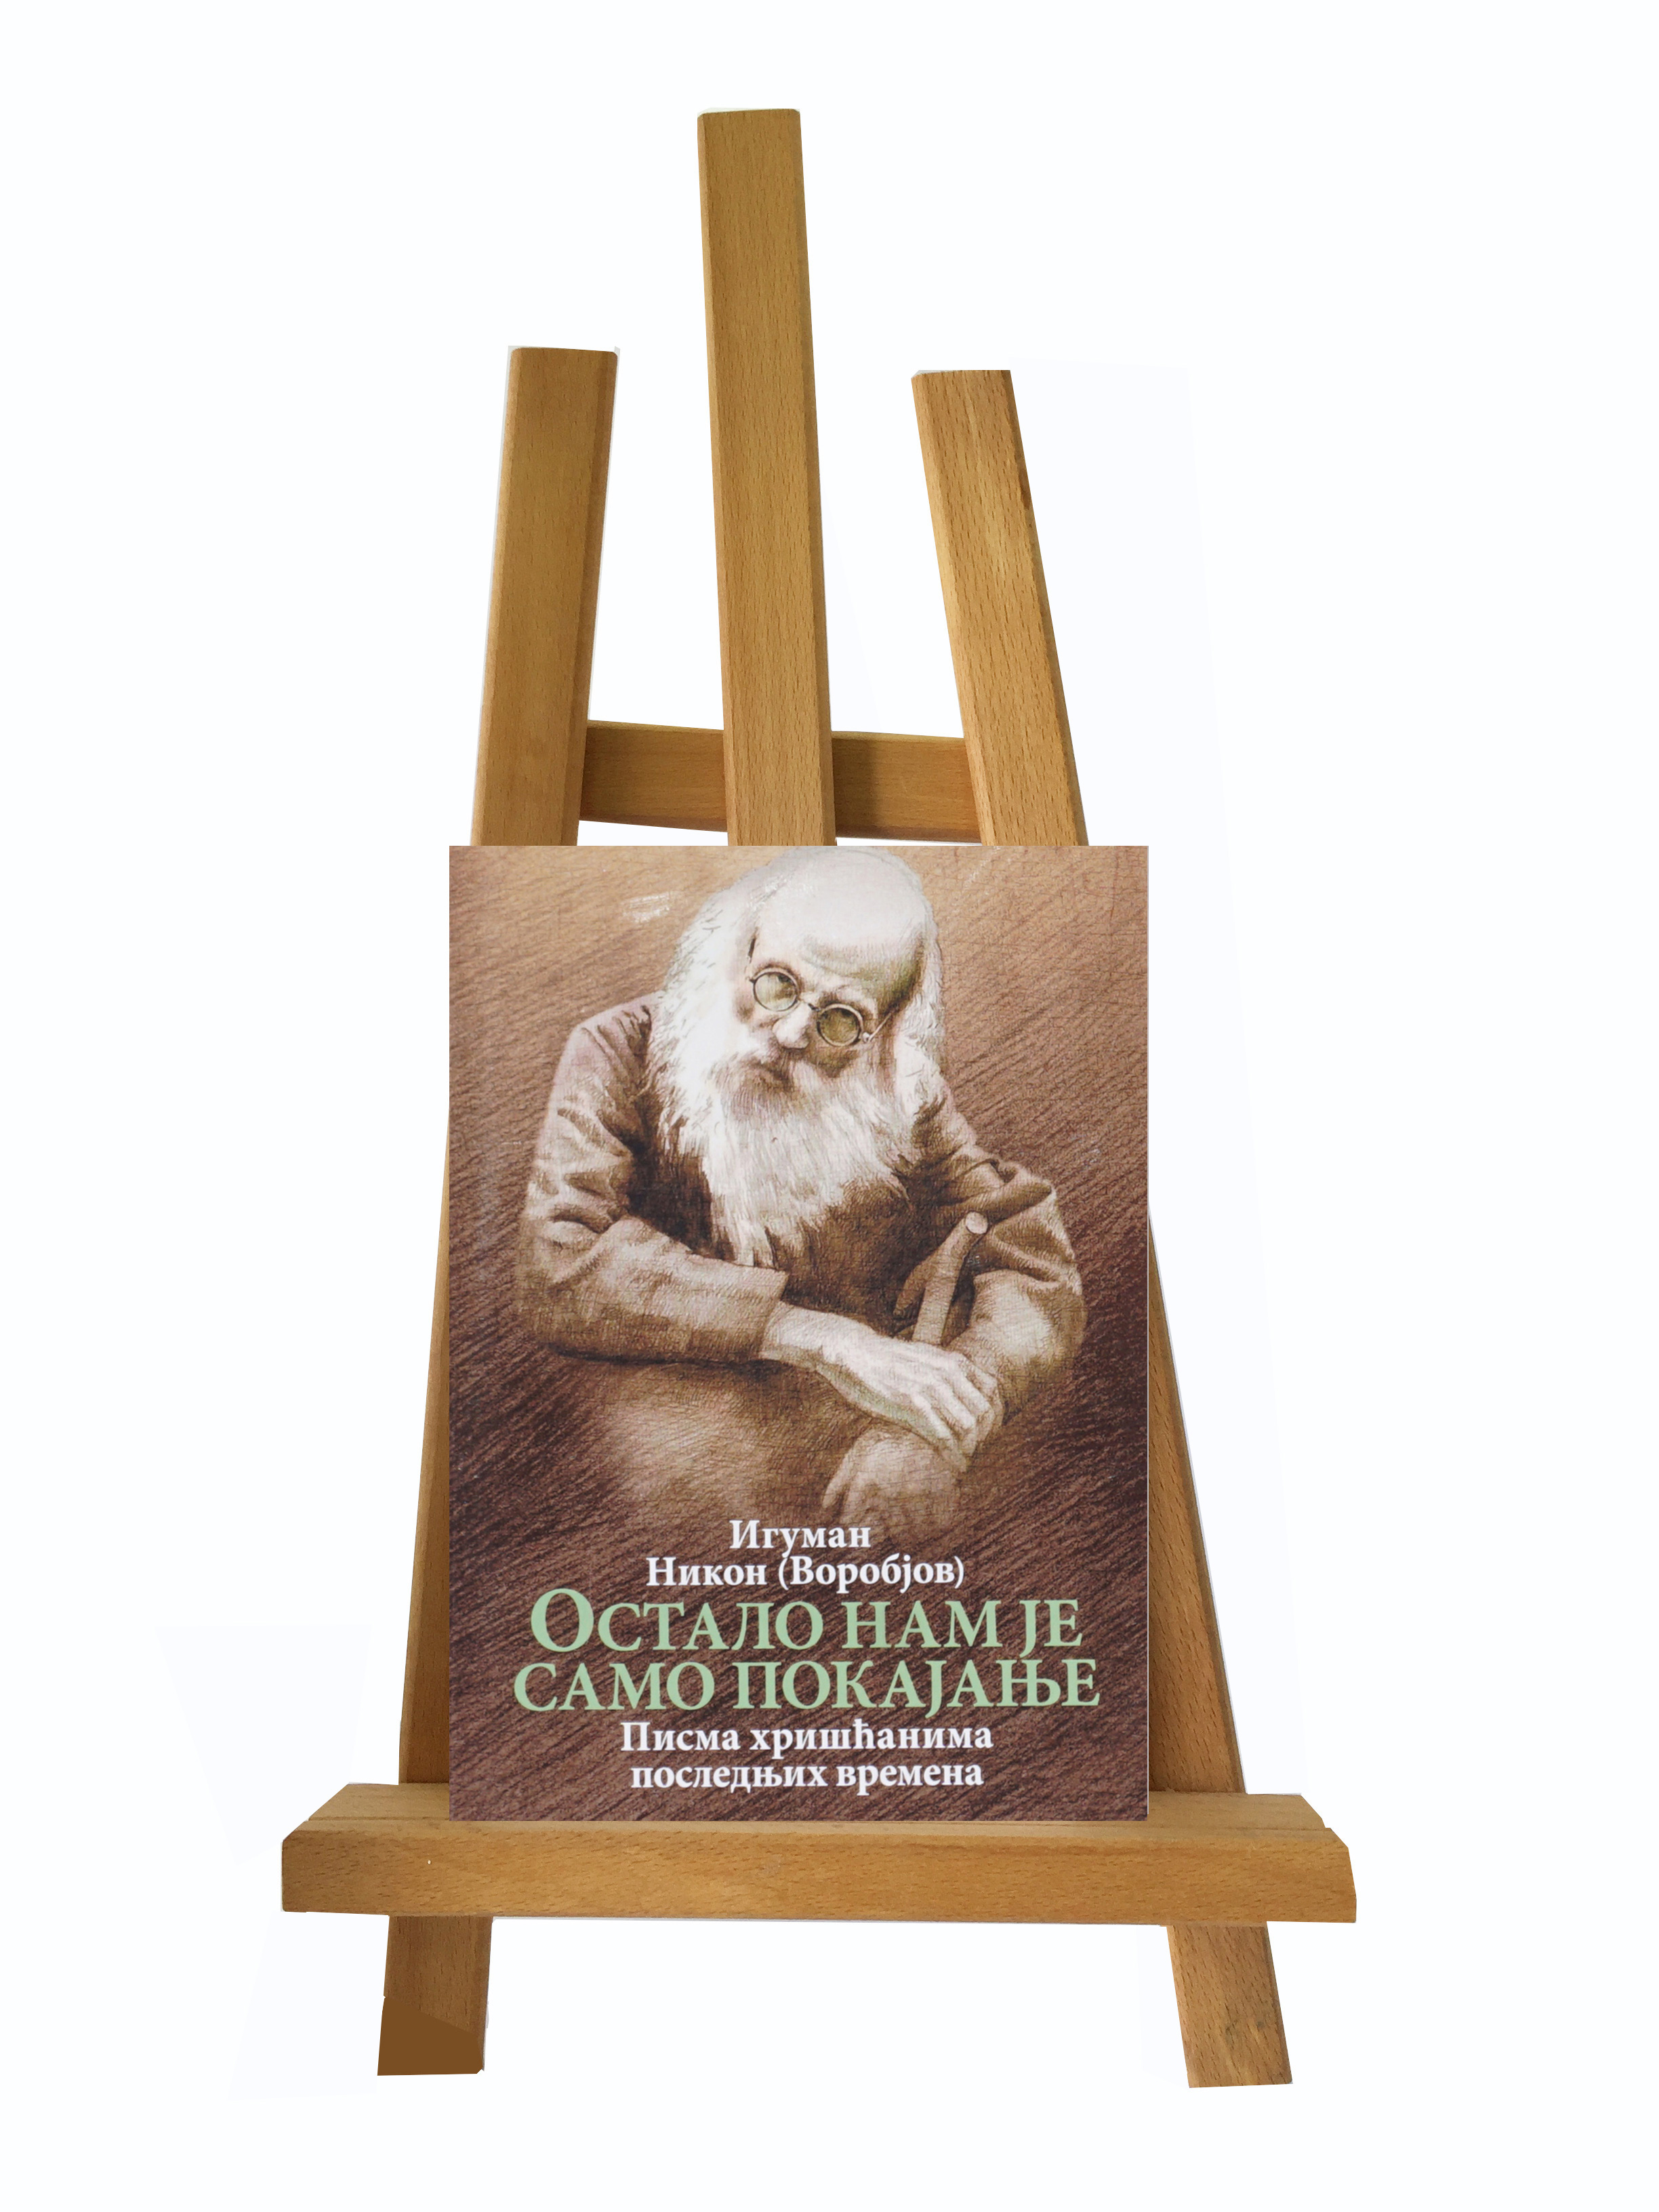 Iguman Nikon (Vorobjov): Ostalo nam je samo pokajanje, Pisma hrišćanima poslednjih vremena